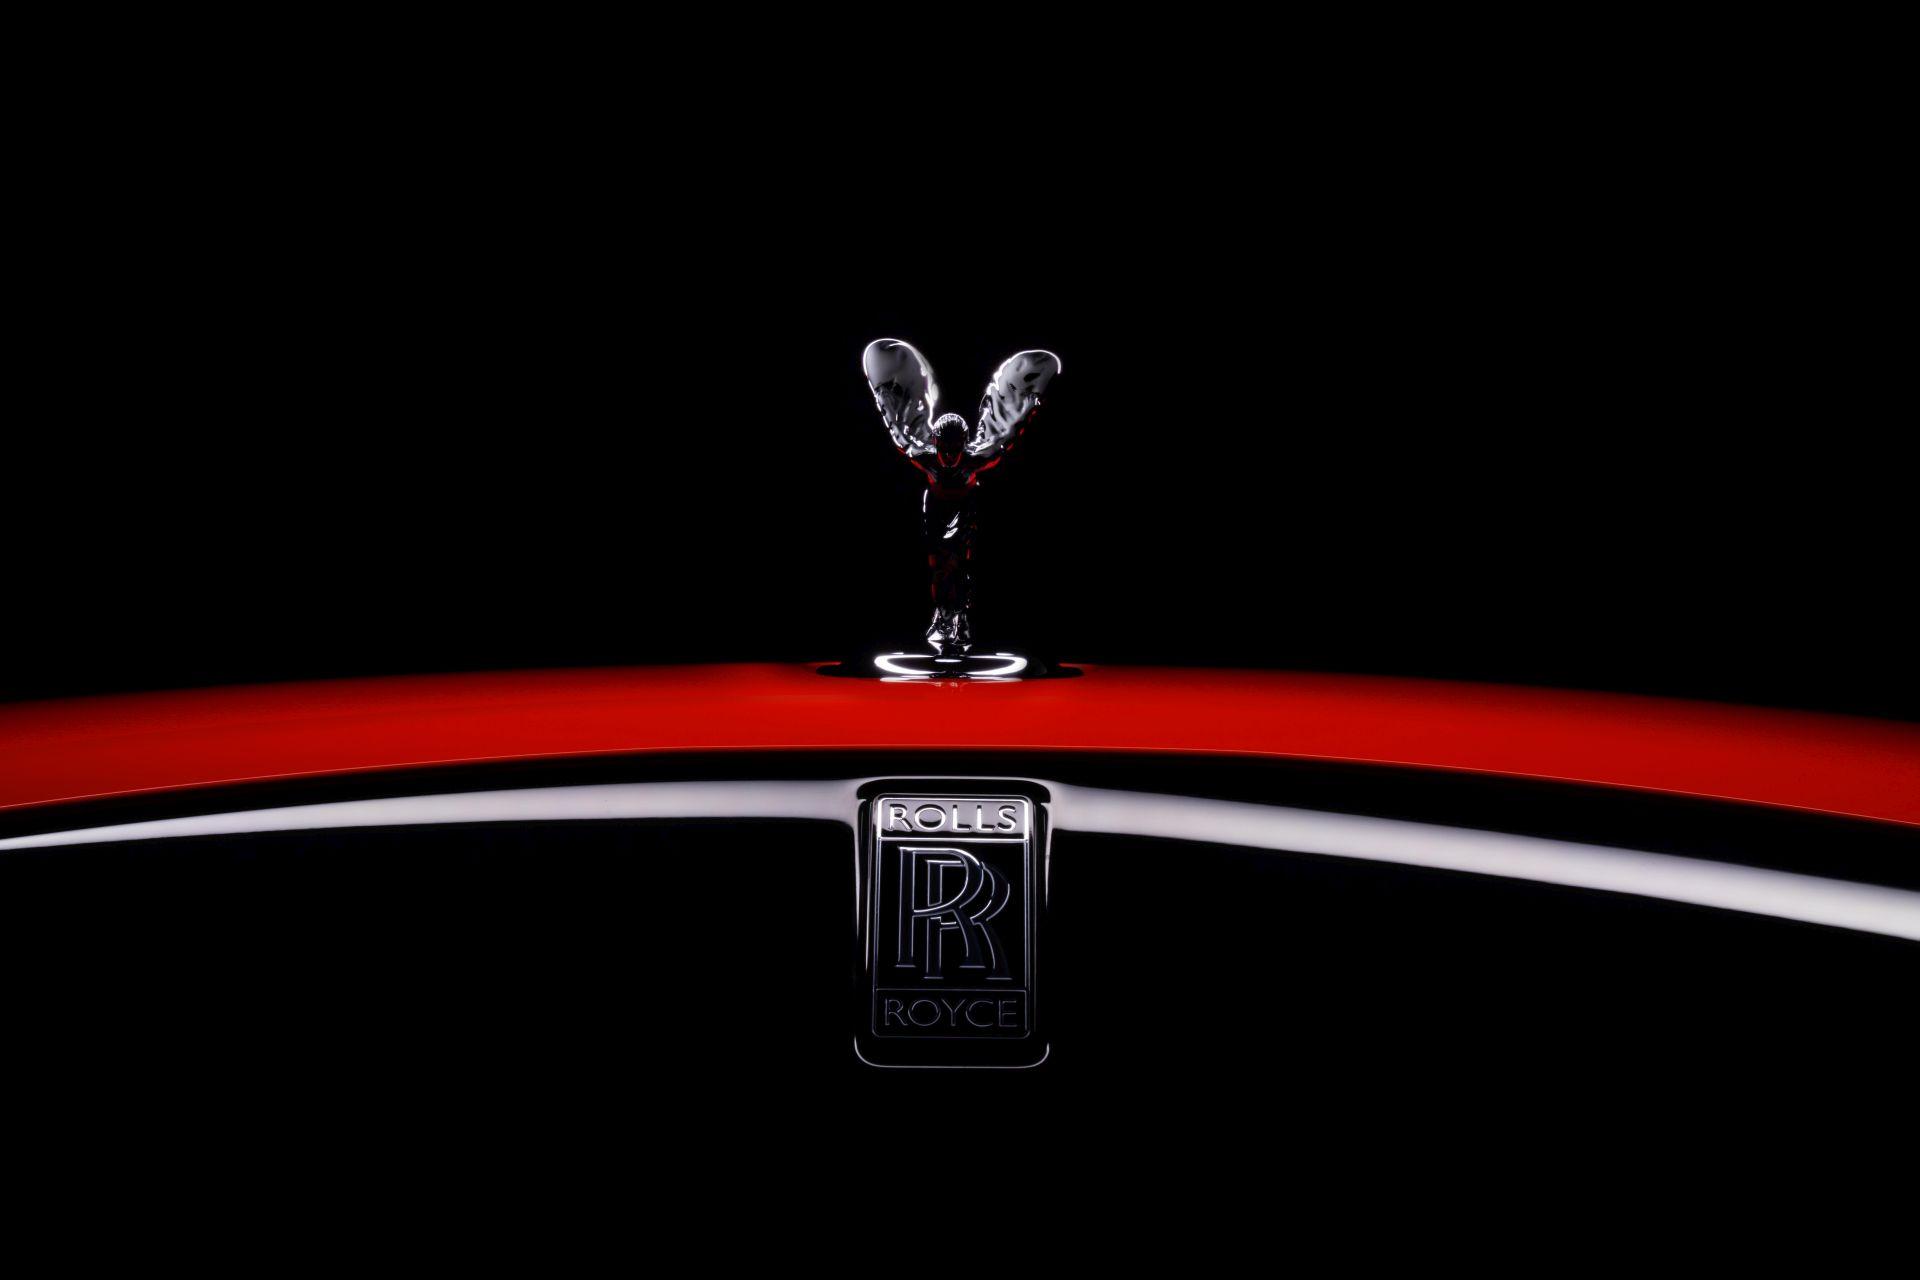 Rolls royce black badge neon nights 1